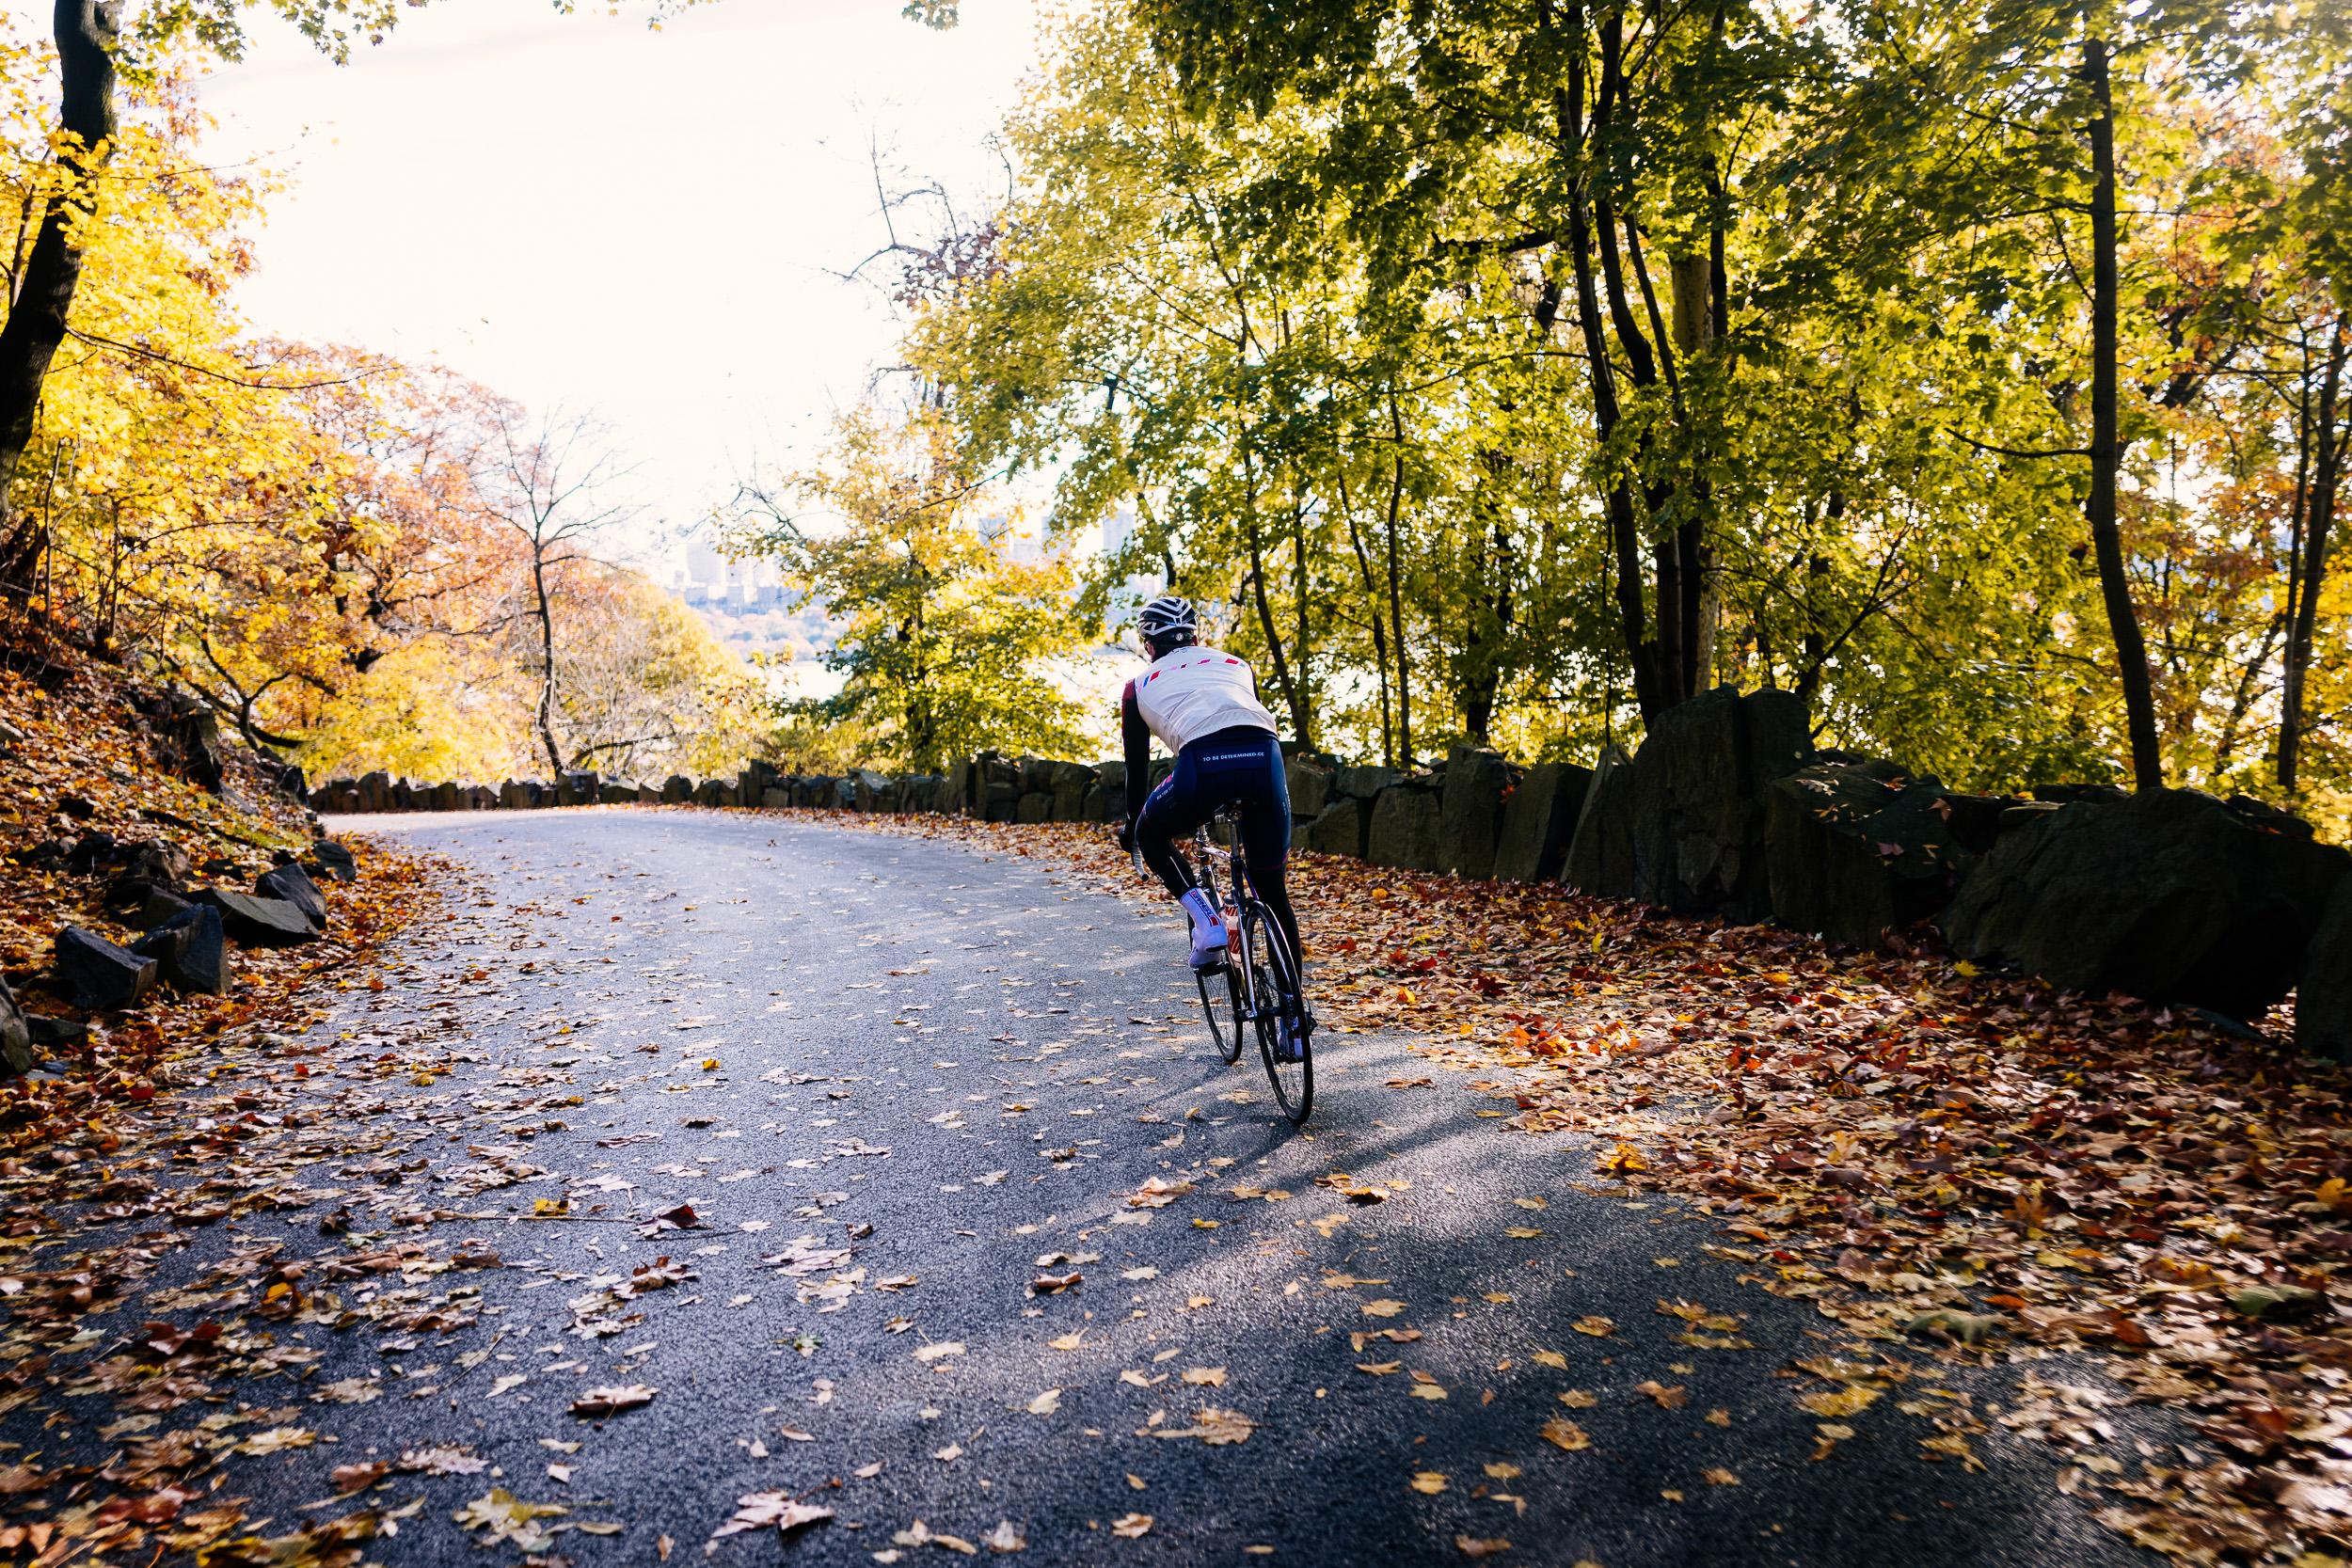 photo-rhetoric-to-be-determined-river-road-fall-foliage-5011.jpg